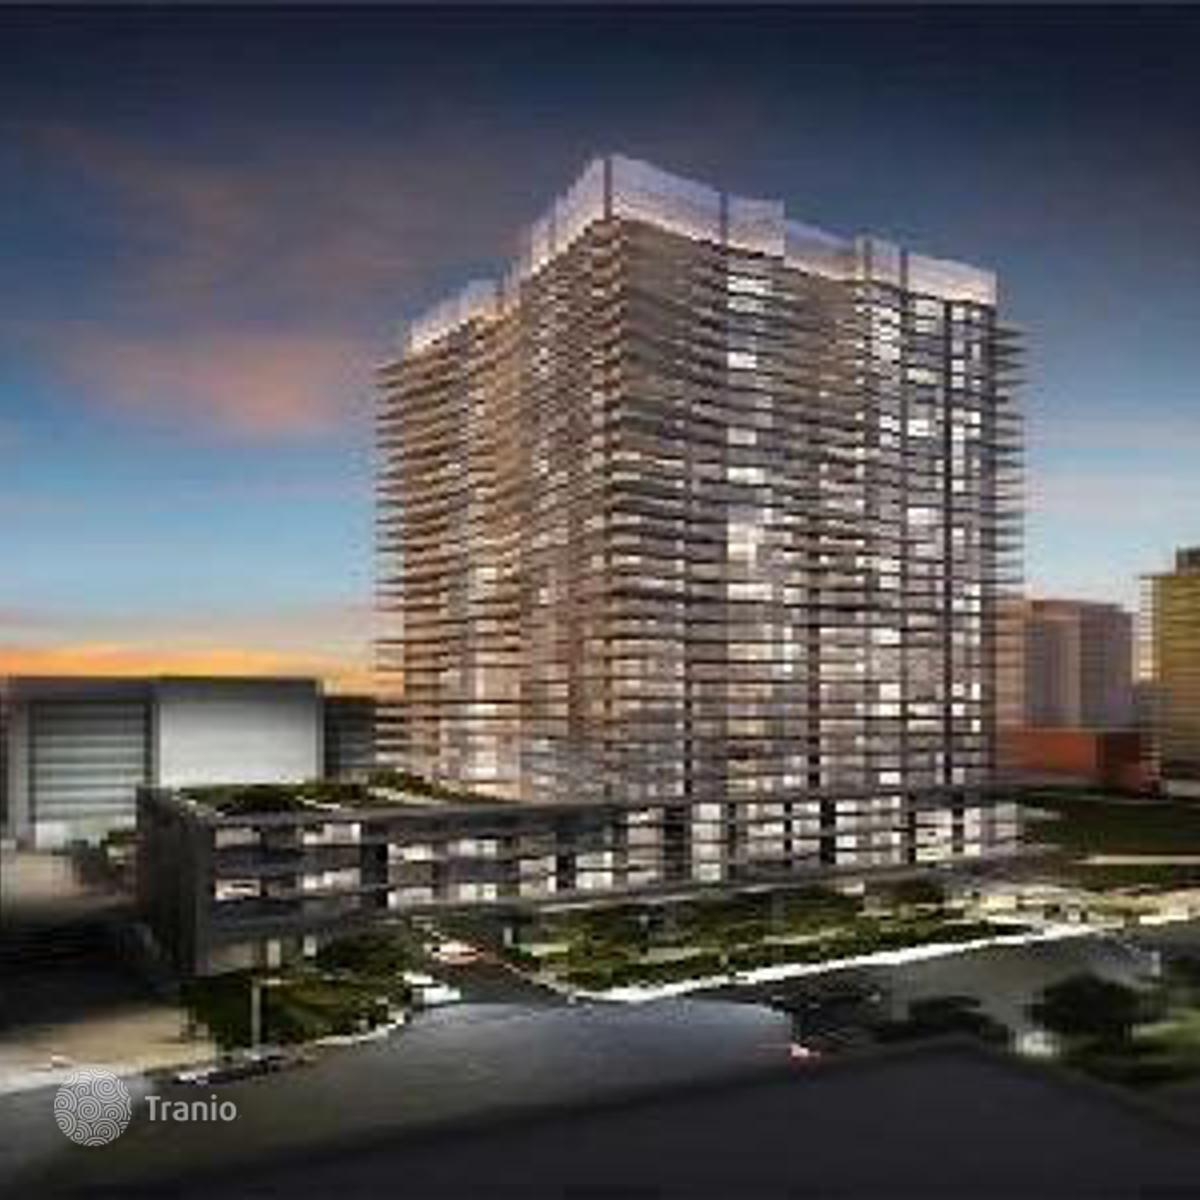 Toronto Apartments: Listing #1339297 In Toronto, Ontario, Canada